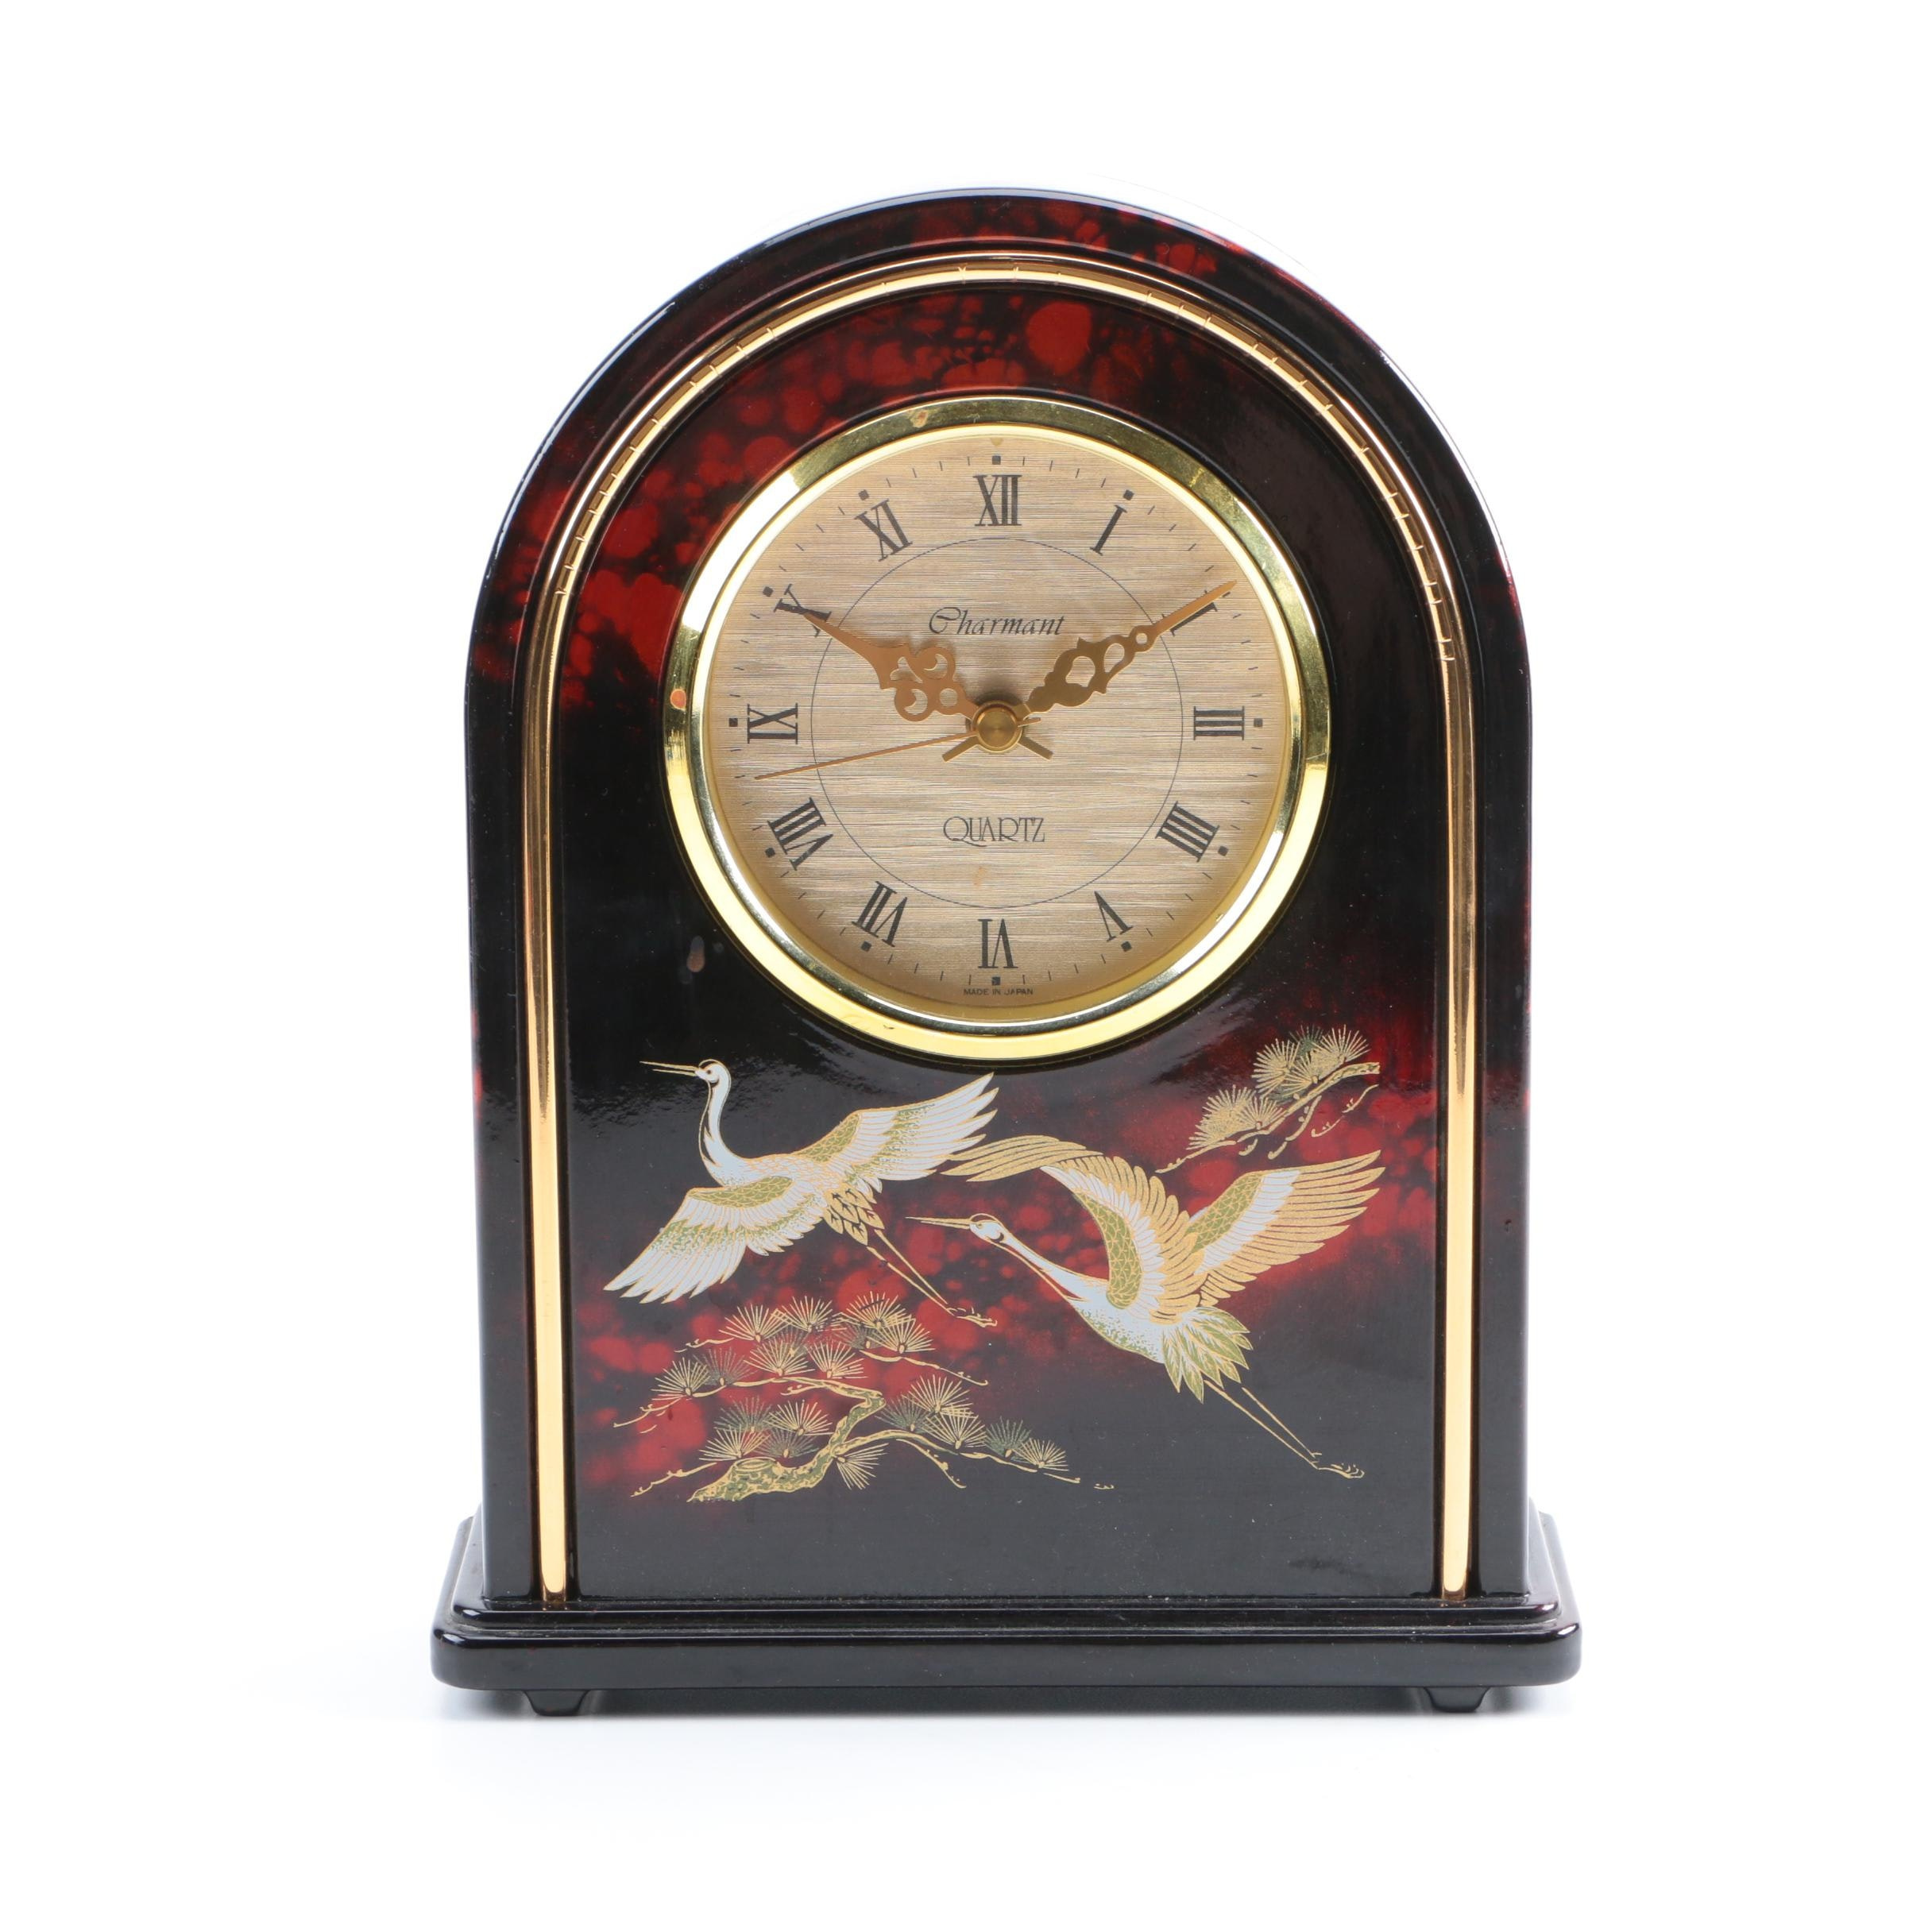 Charmant Crane-Themed Mantel Clock